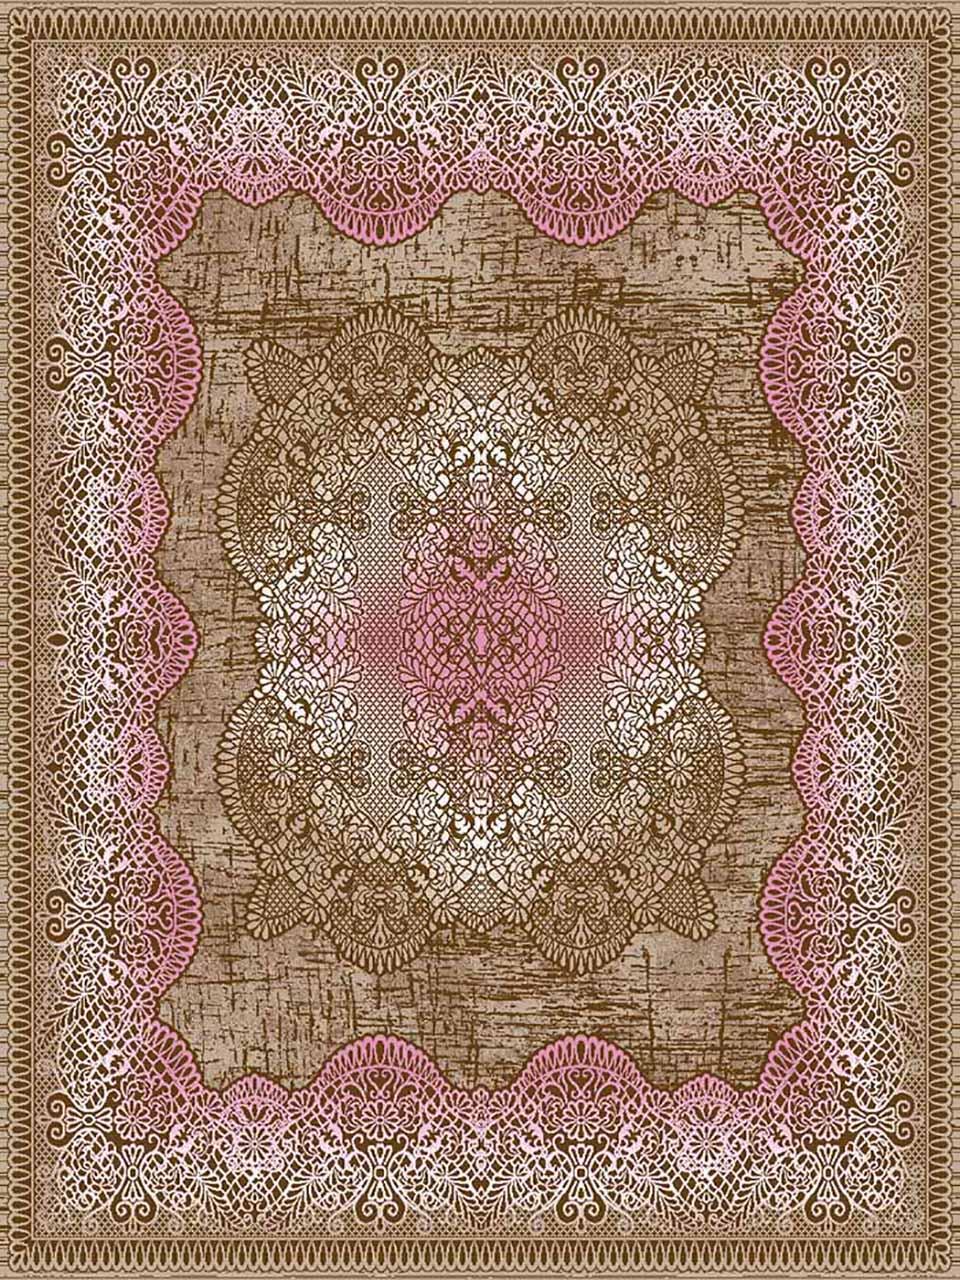 فرش (7032) پلی پرو پیلن - 8 رنگ - 410 شانه - قهوه ای صورتی - تراکم 1000